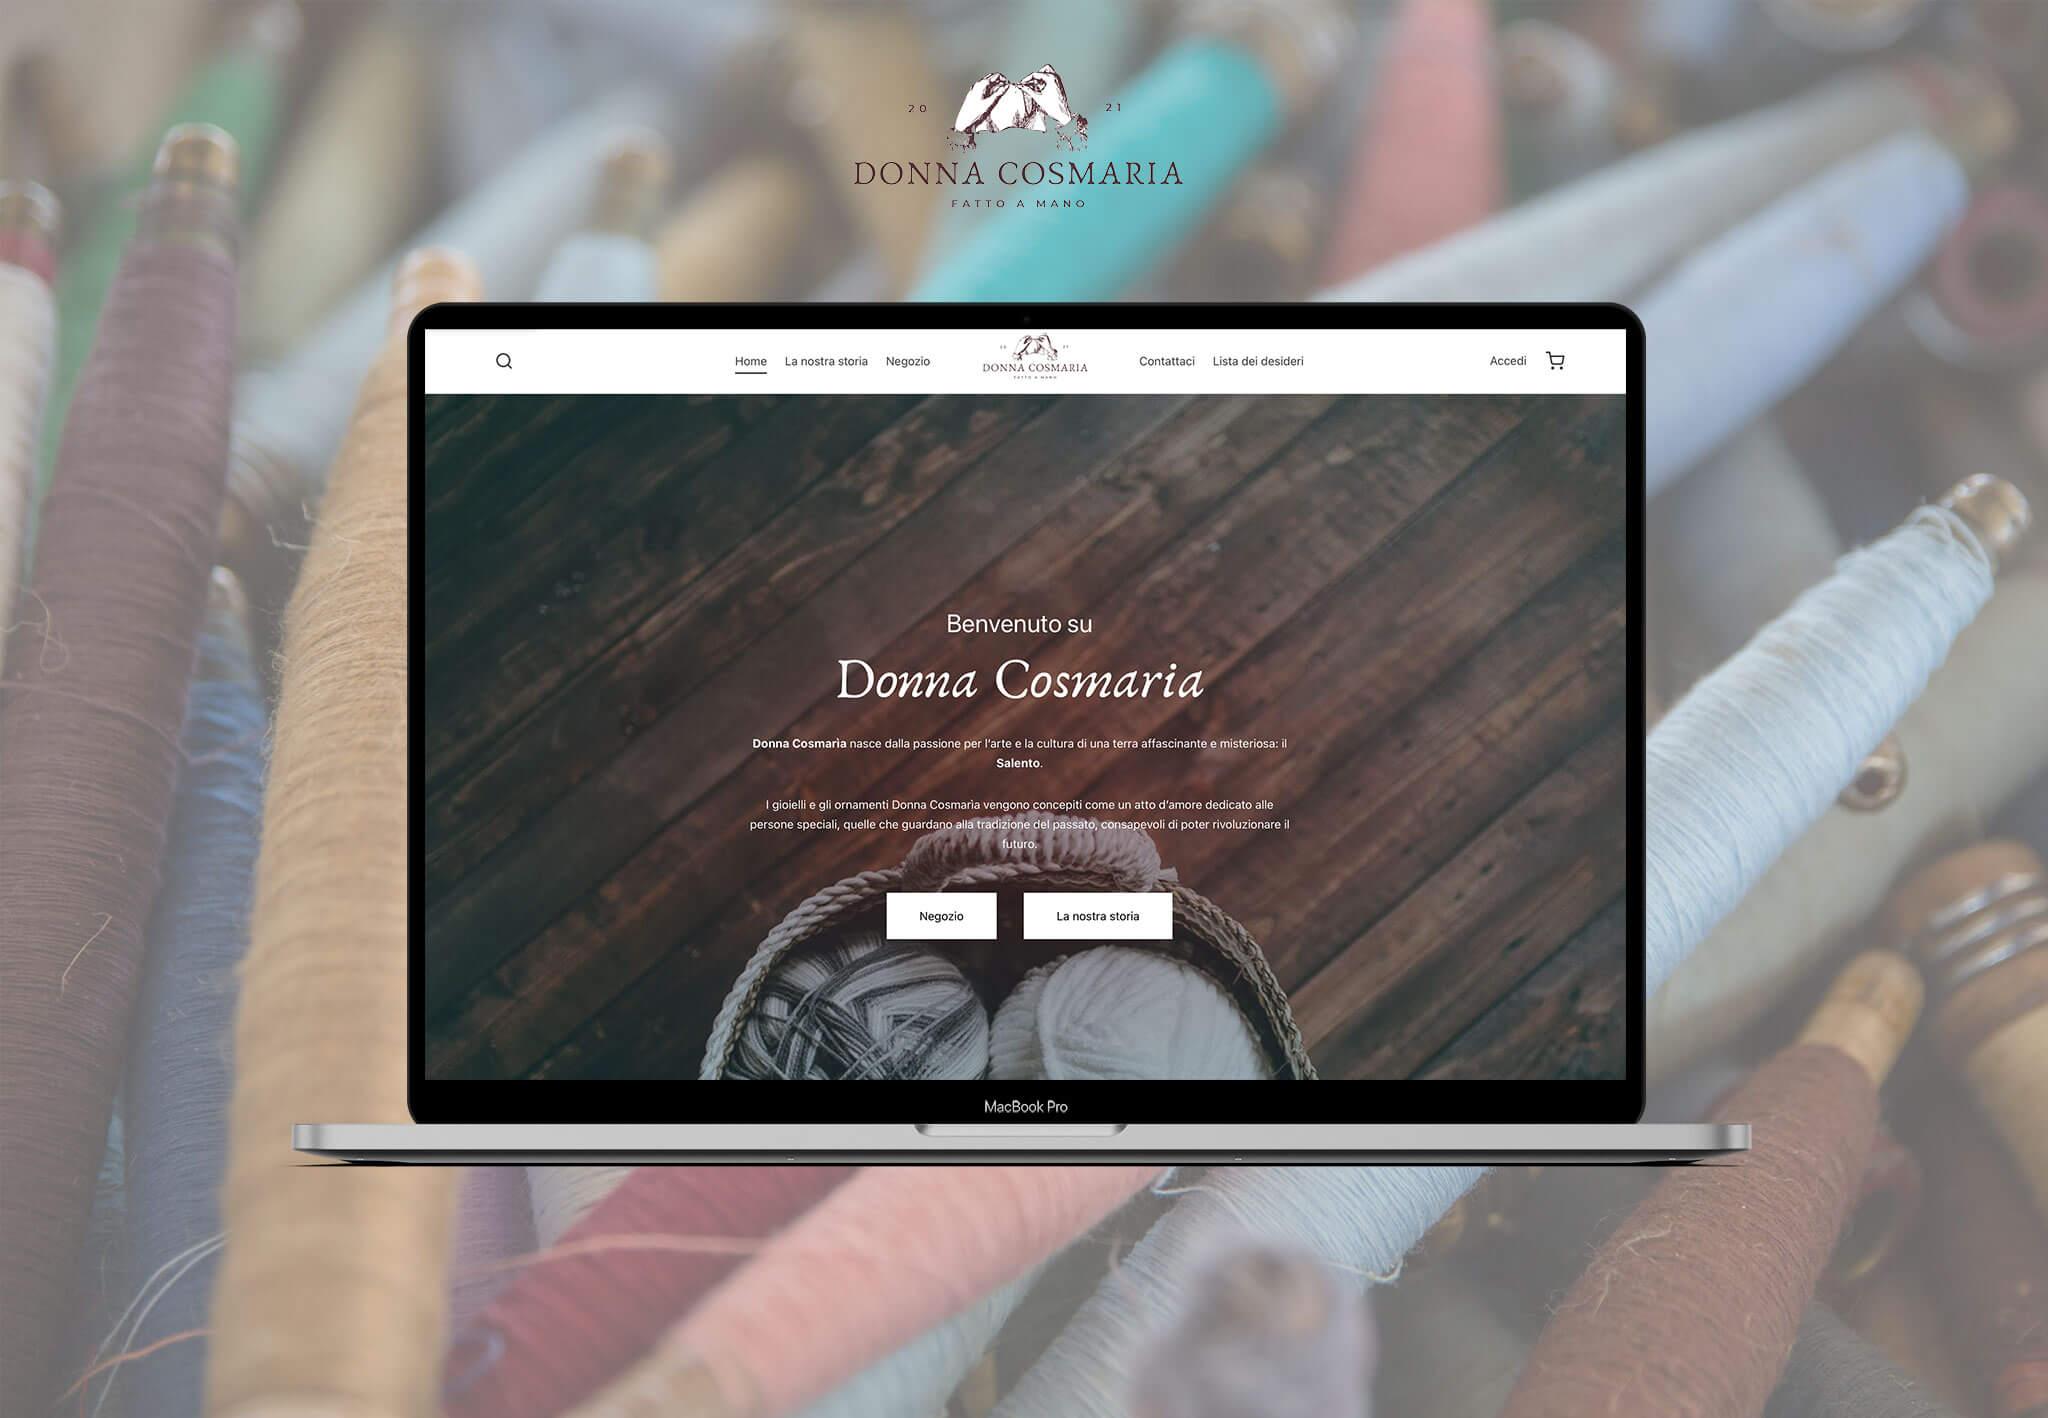 donna-cosmaria-ecommerce-project-andiamo-live-desktop